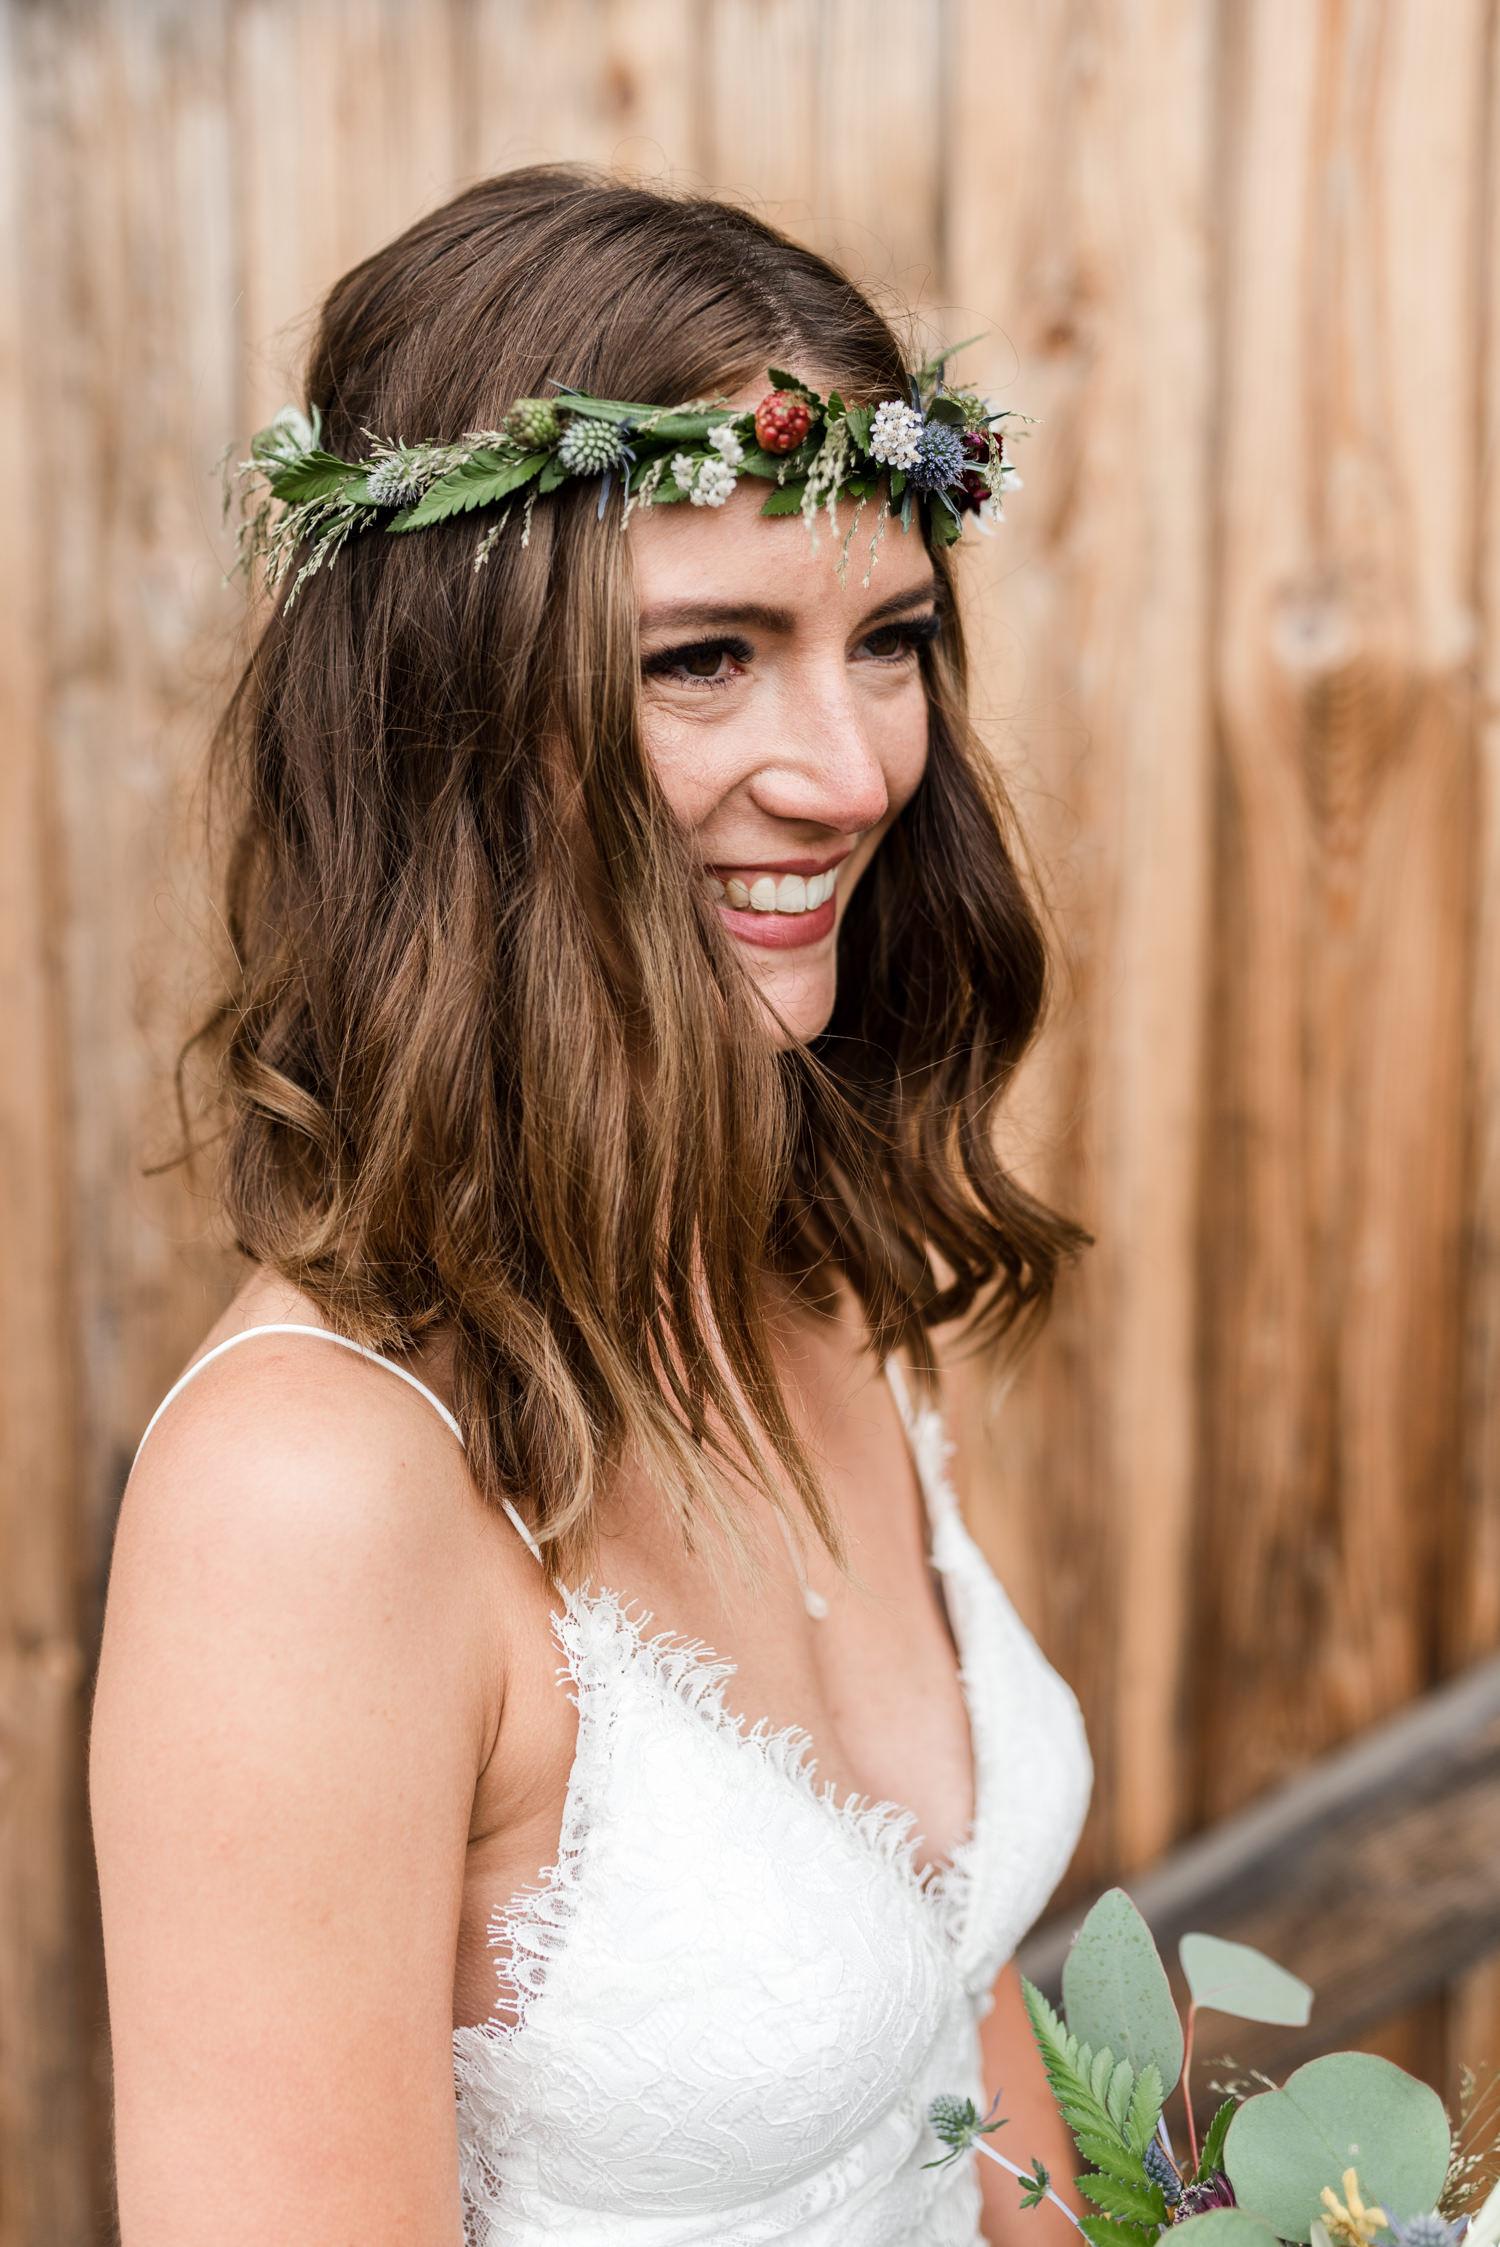 Braut mit Haarkranz aus Disteln, fotografiert bei Boho Wedding am Grandsberger Hof.